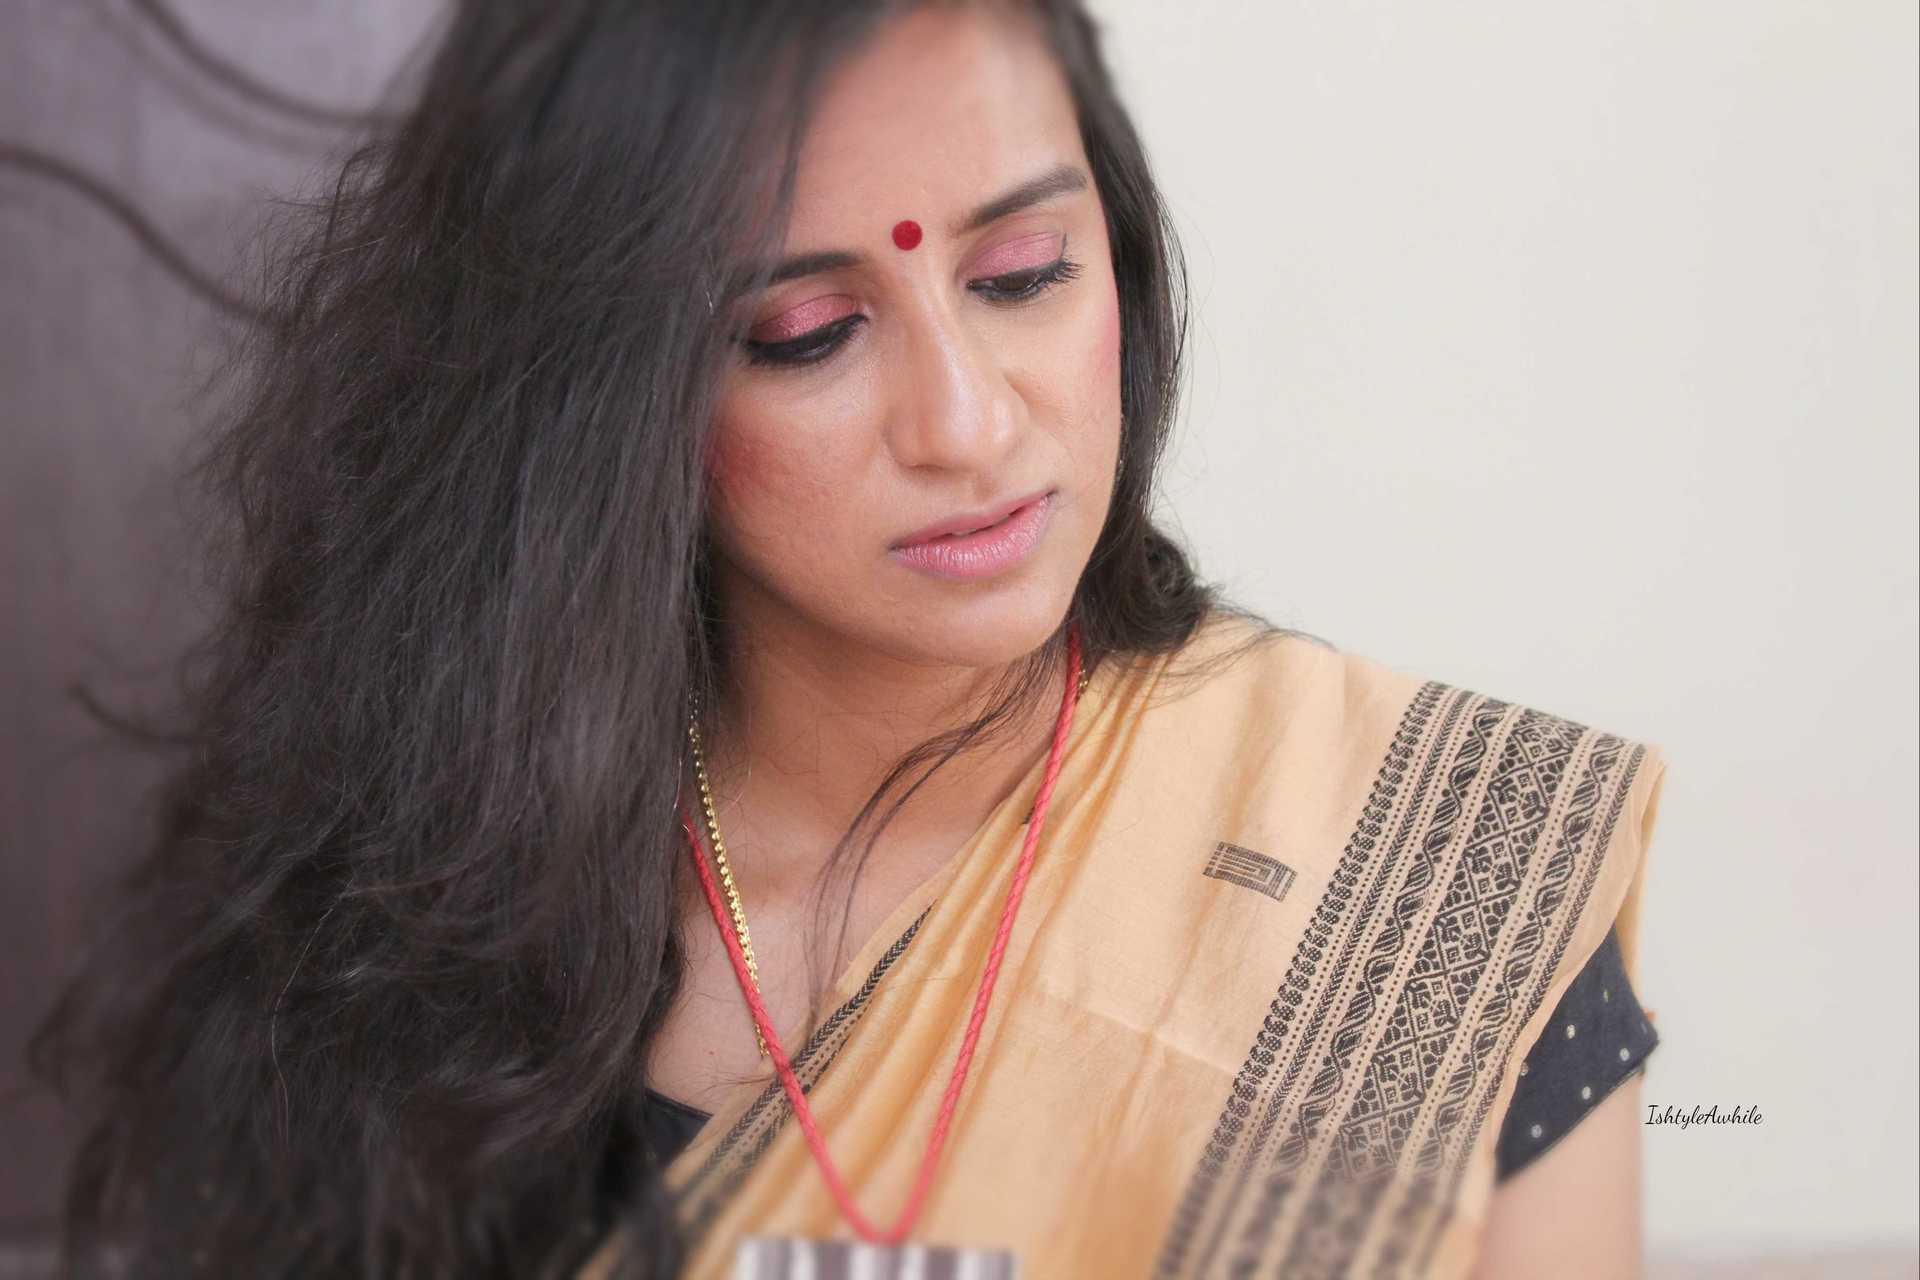 IshtyleAwhile - burgandy makeup look chennai beauty blogger